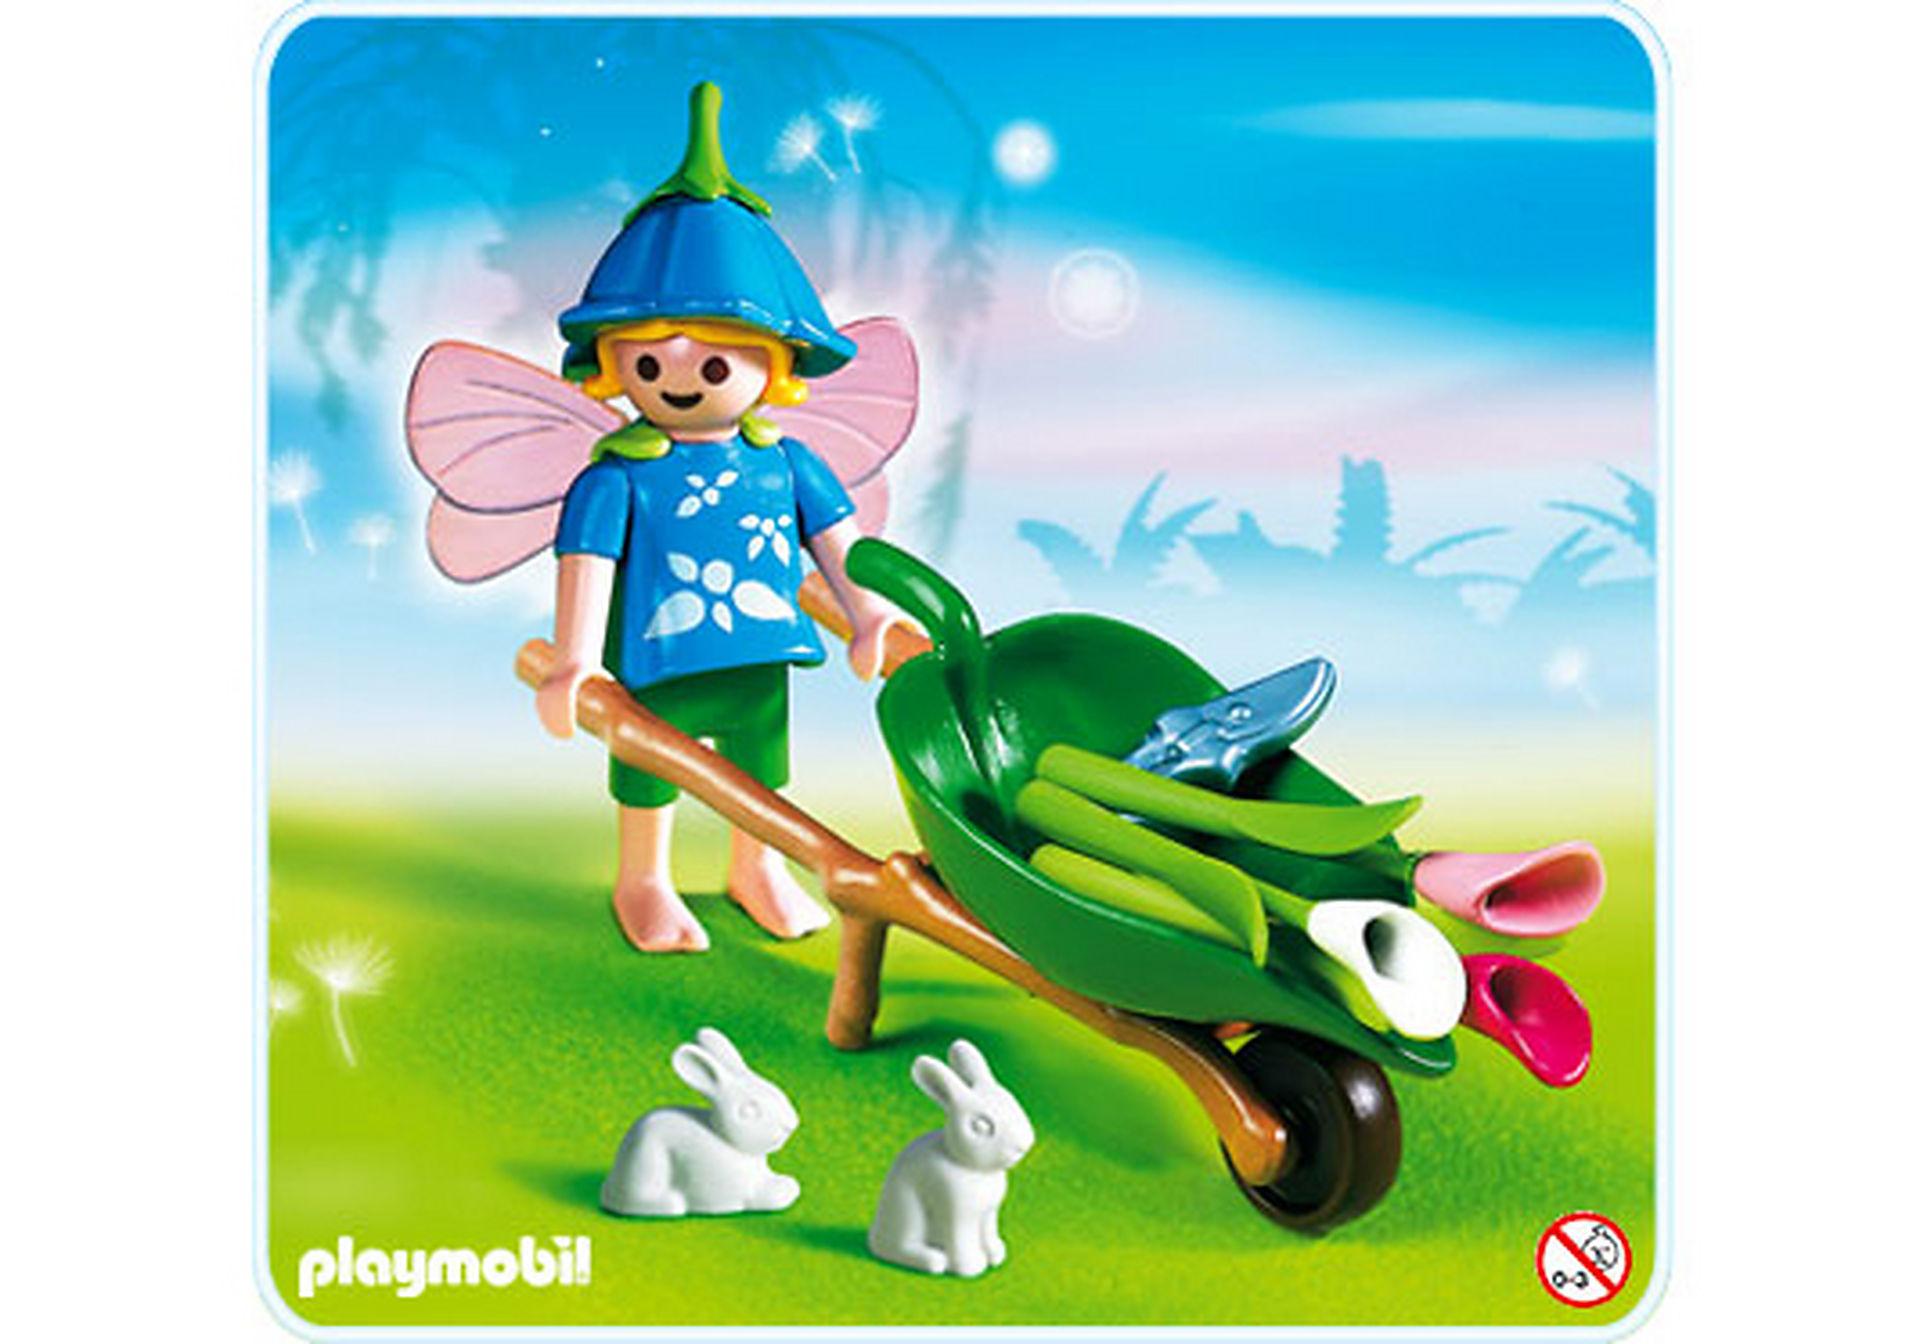 http://media.playmobil.com/i/playmobil/4196-A_product_detail/Fée avec brouette